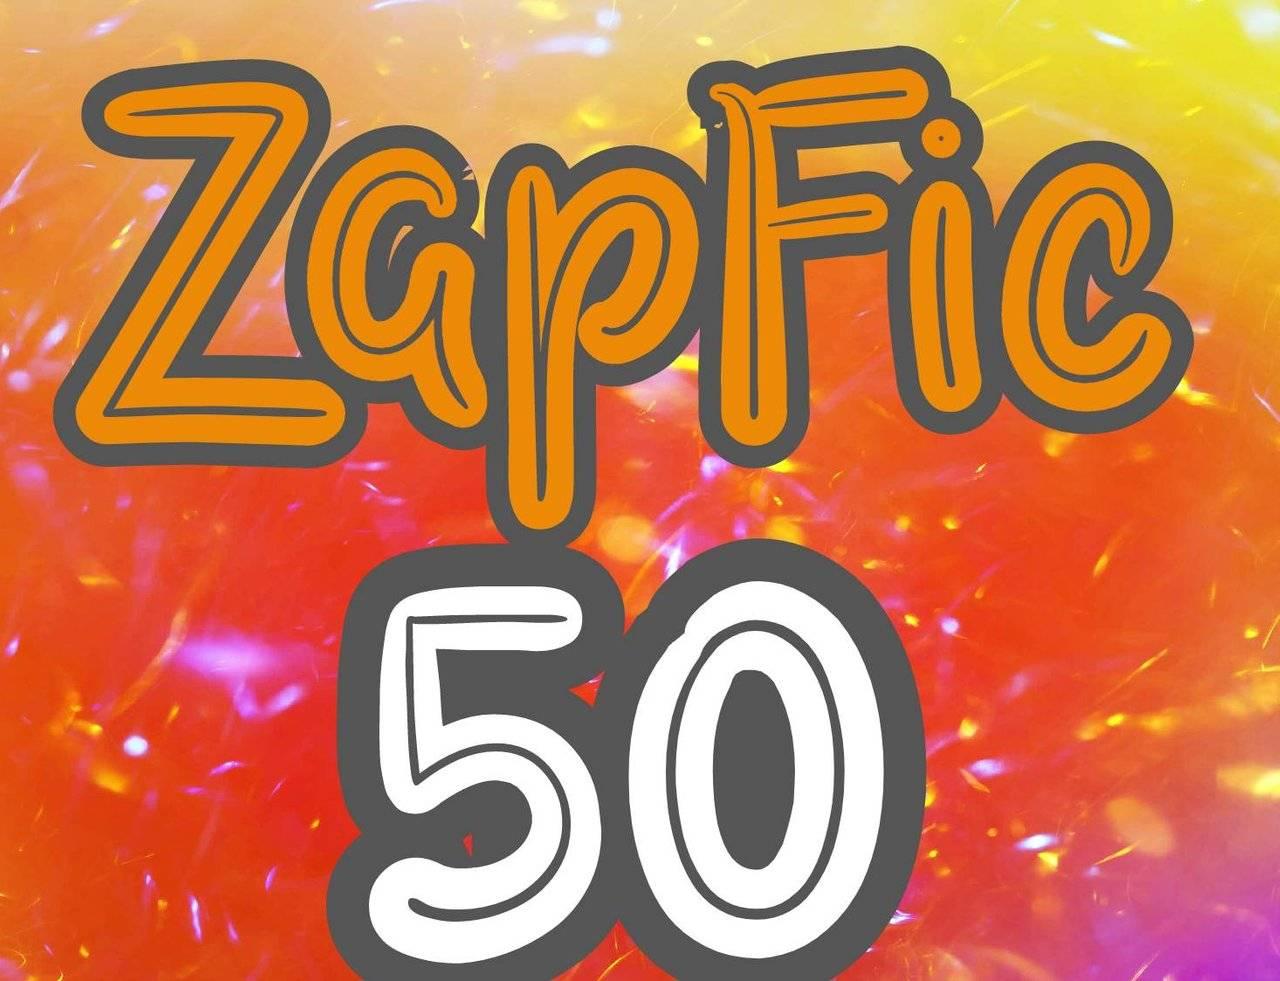 ZaPFICWeekend50WordsImage.jpg